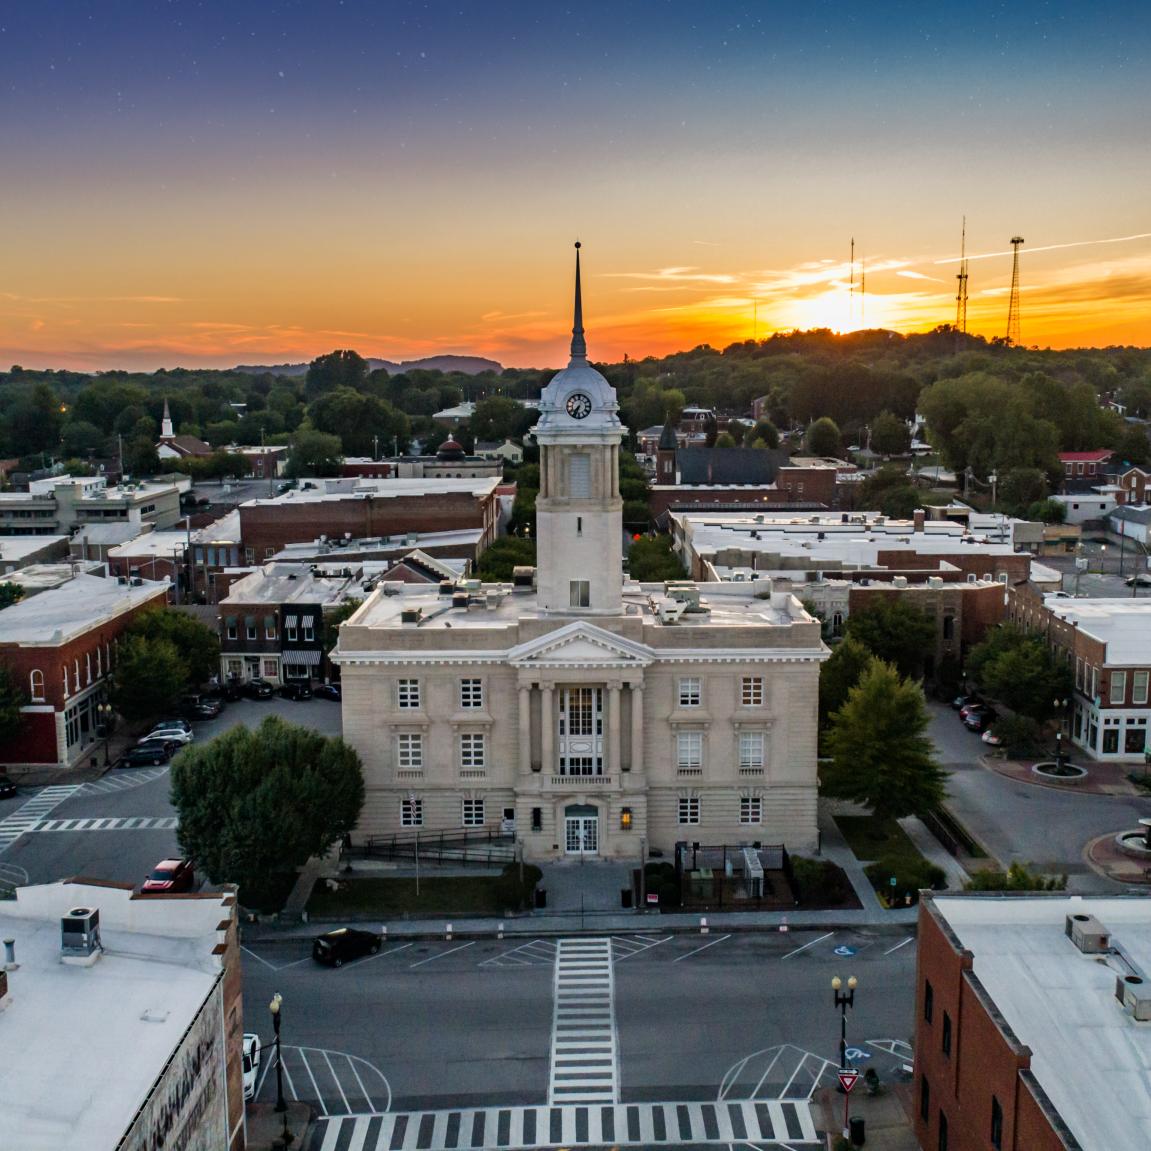 Columbia Square at Sunset Aerial 1